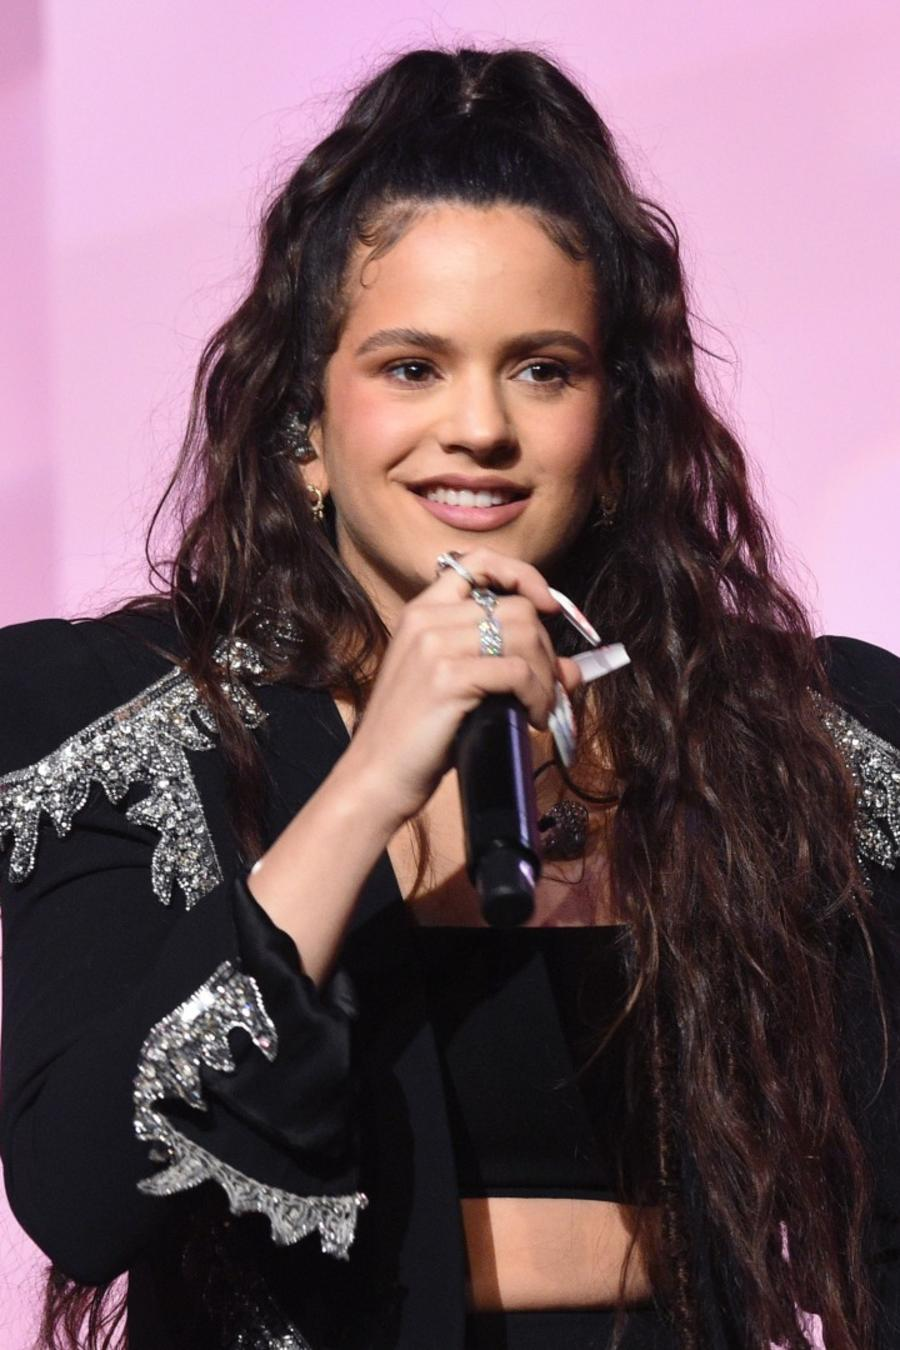 Rosalia to perform at 2020 Grammys